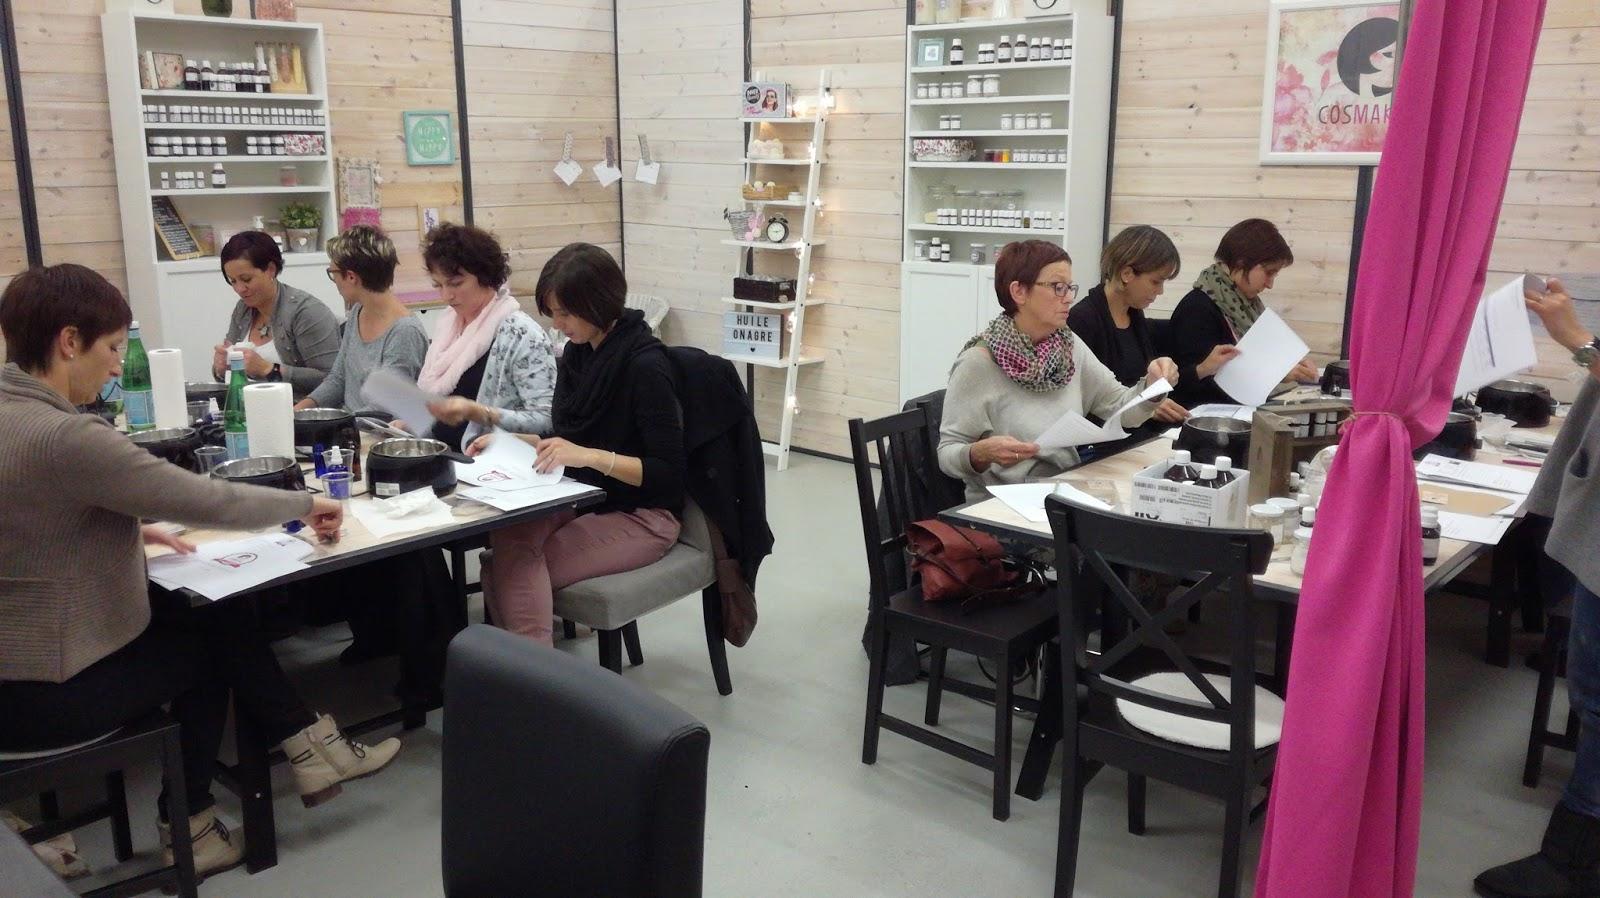 https://madamepetimin.blogspot.com/2017/12/jai-teste-un-atelier-chez-cosmaking.html